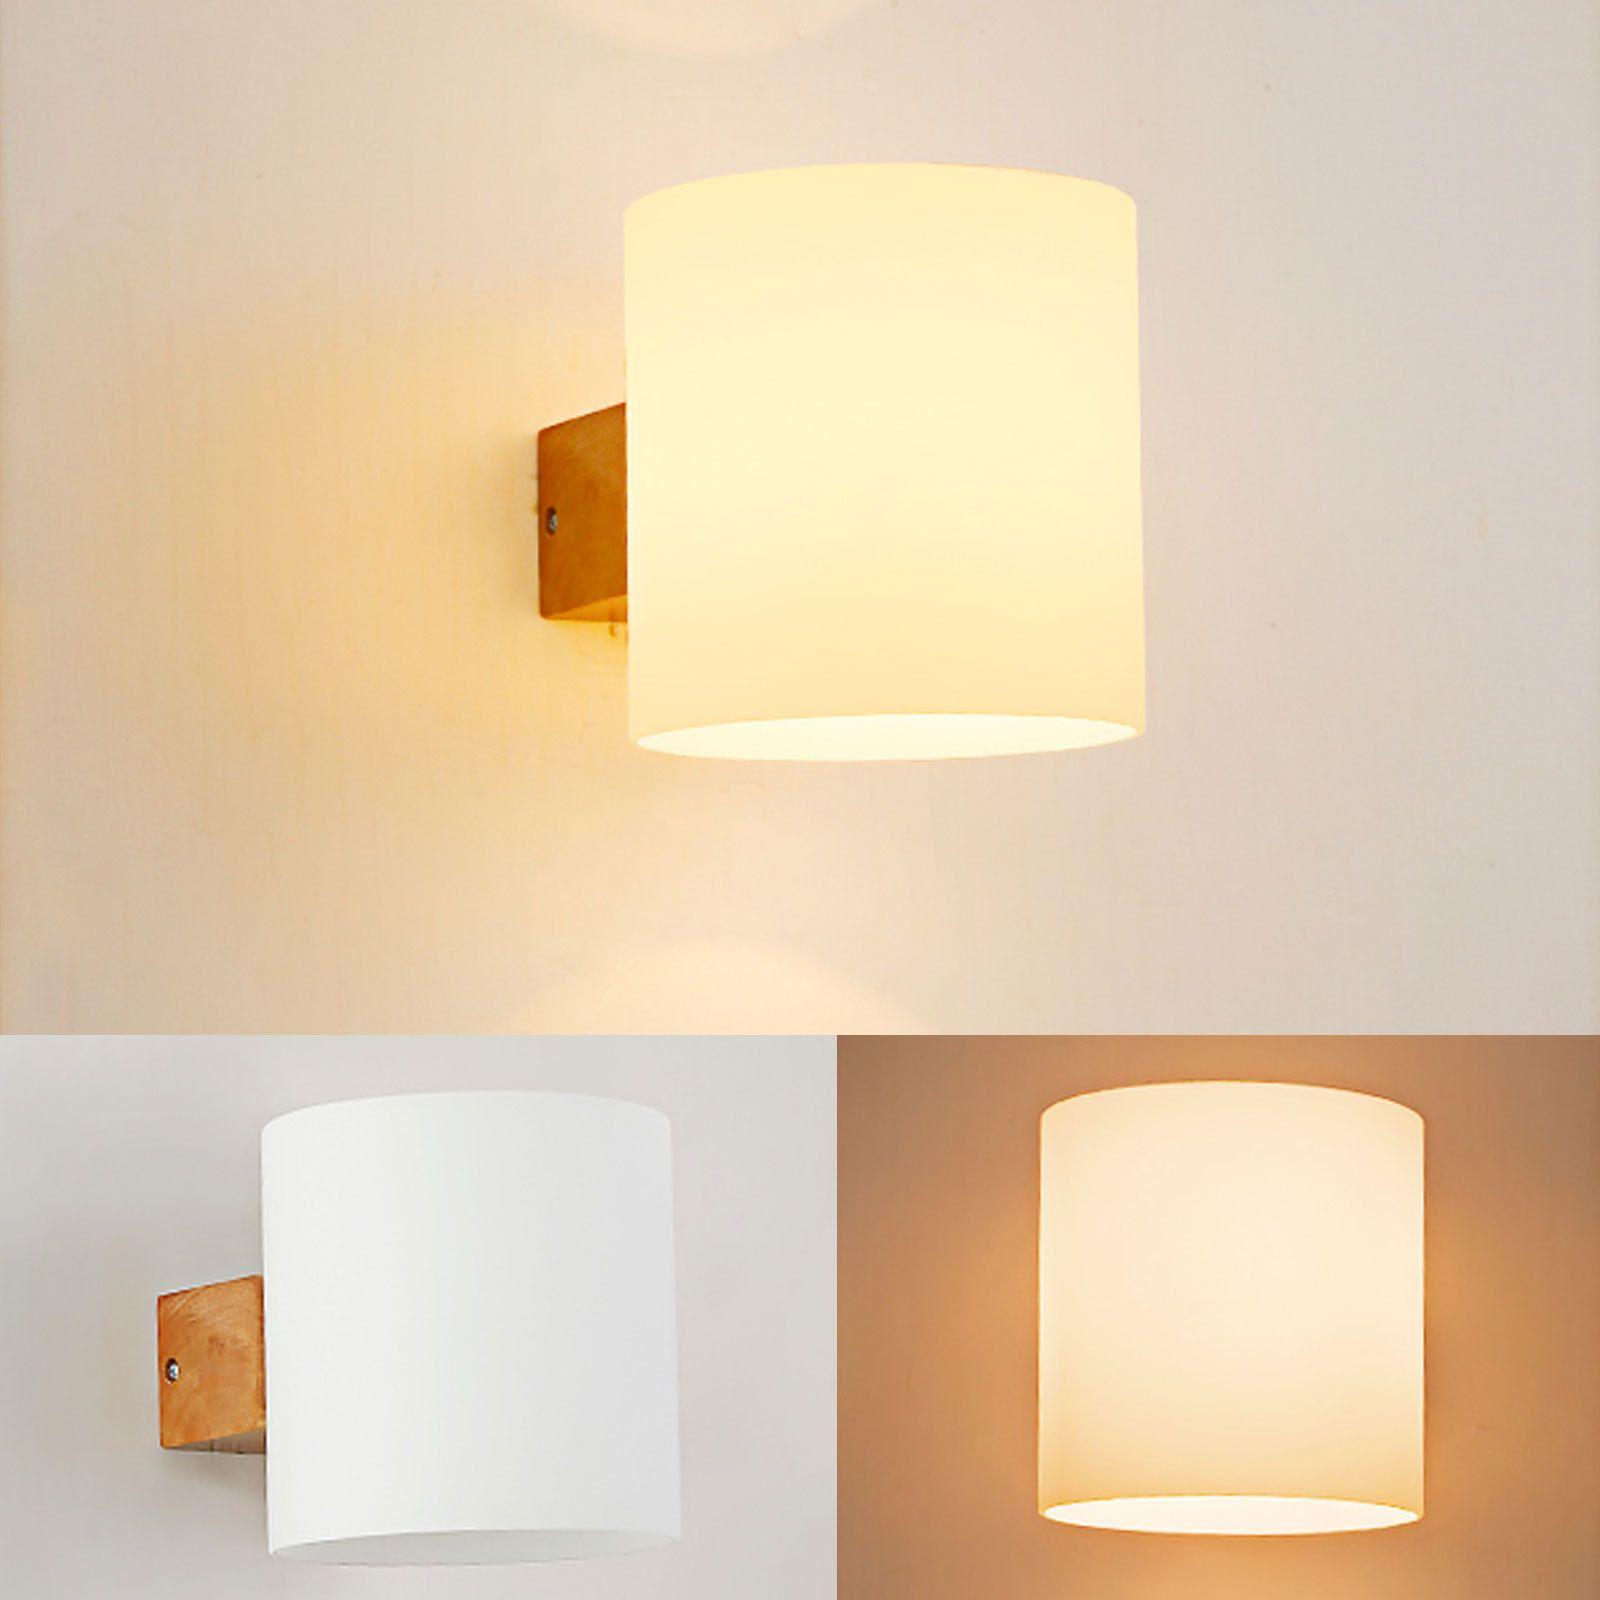 Ranpo modern wooden wall lamp e base sconce hallway bedroom home